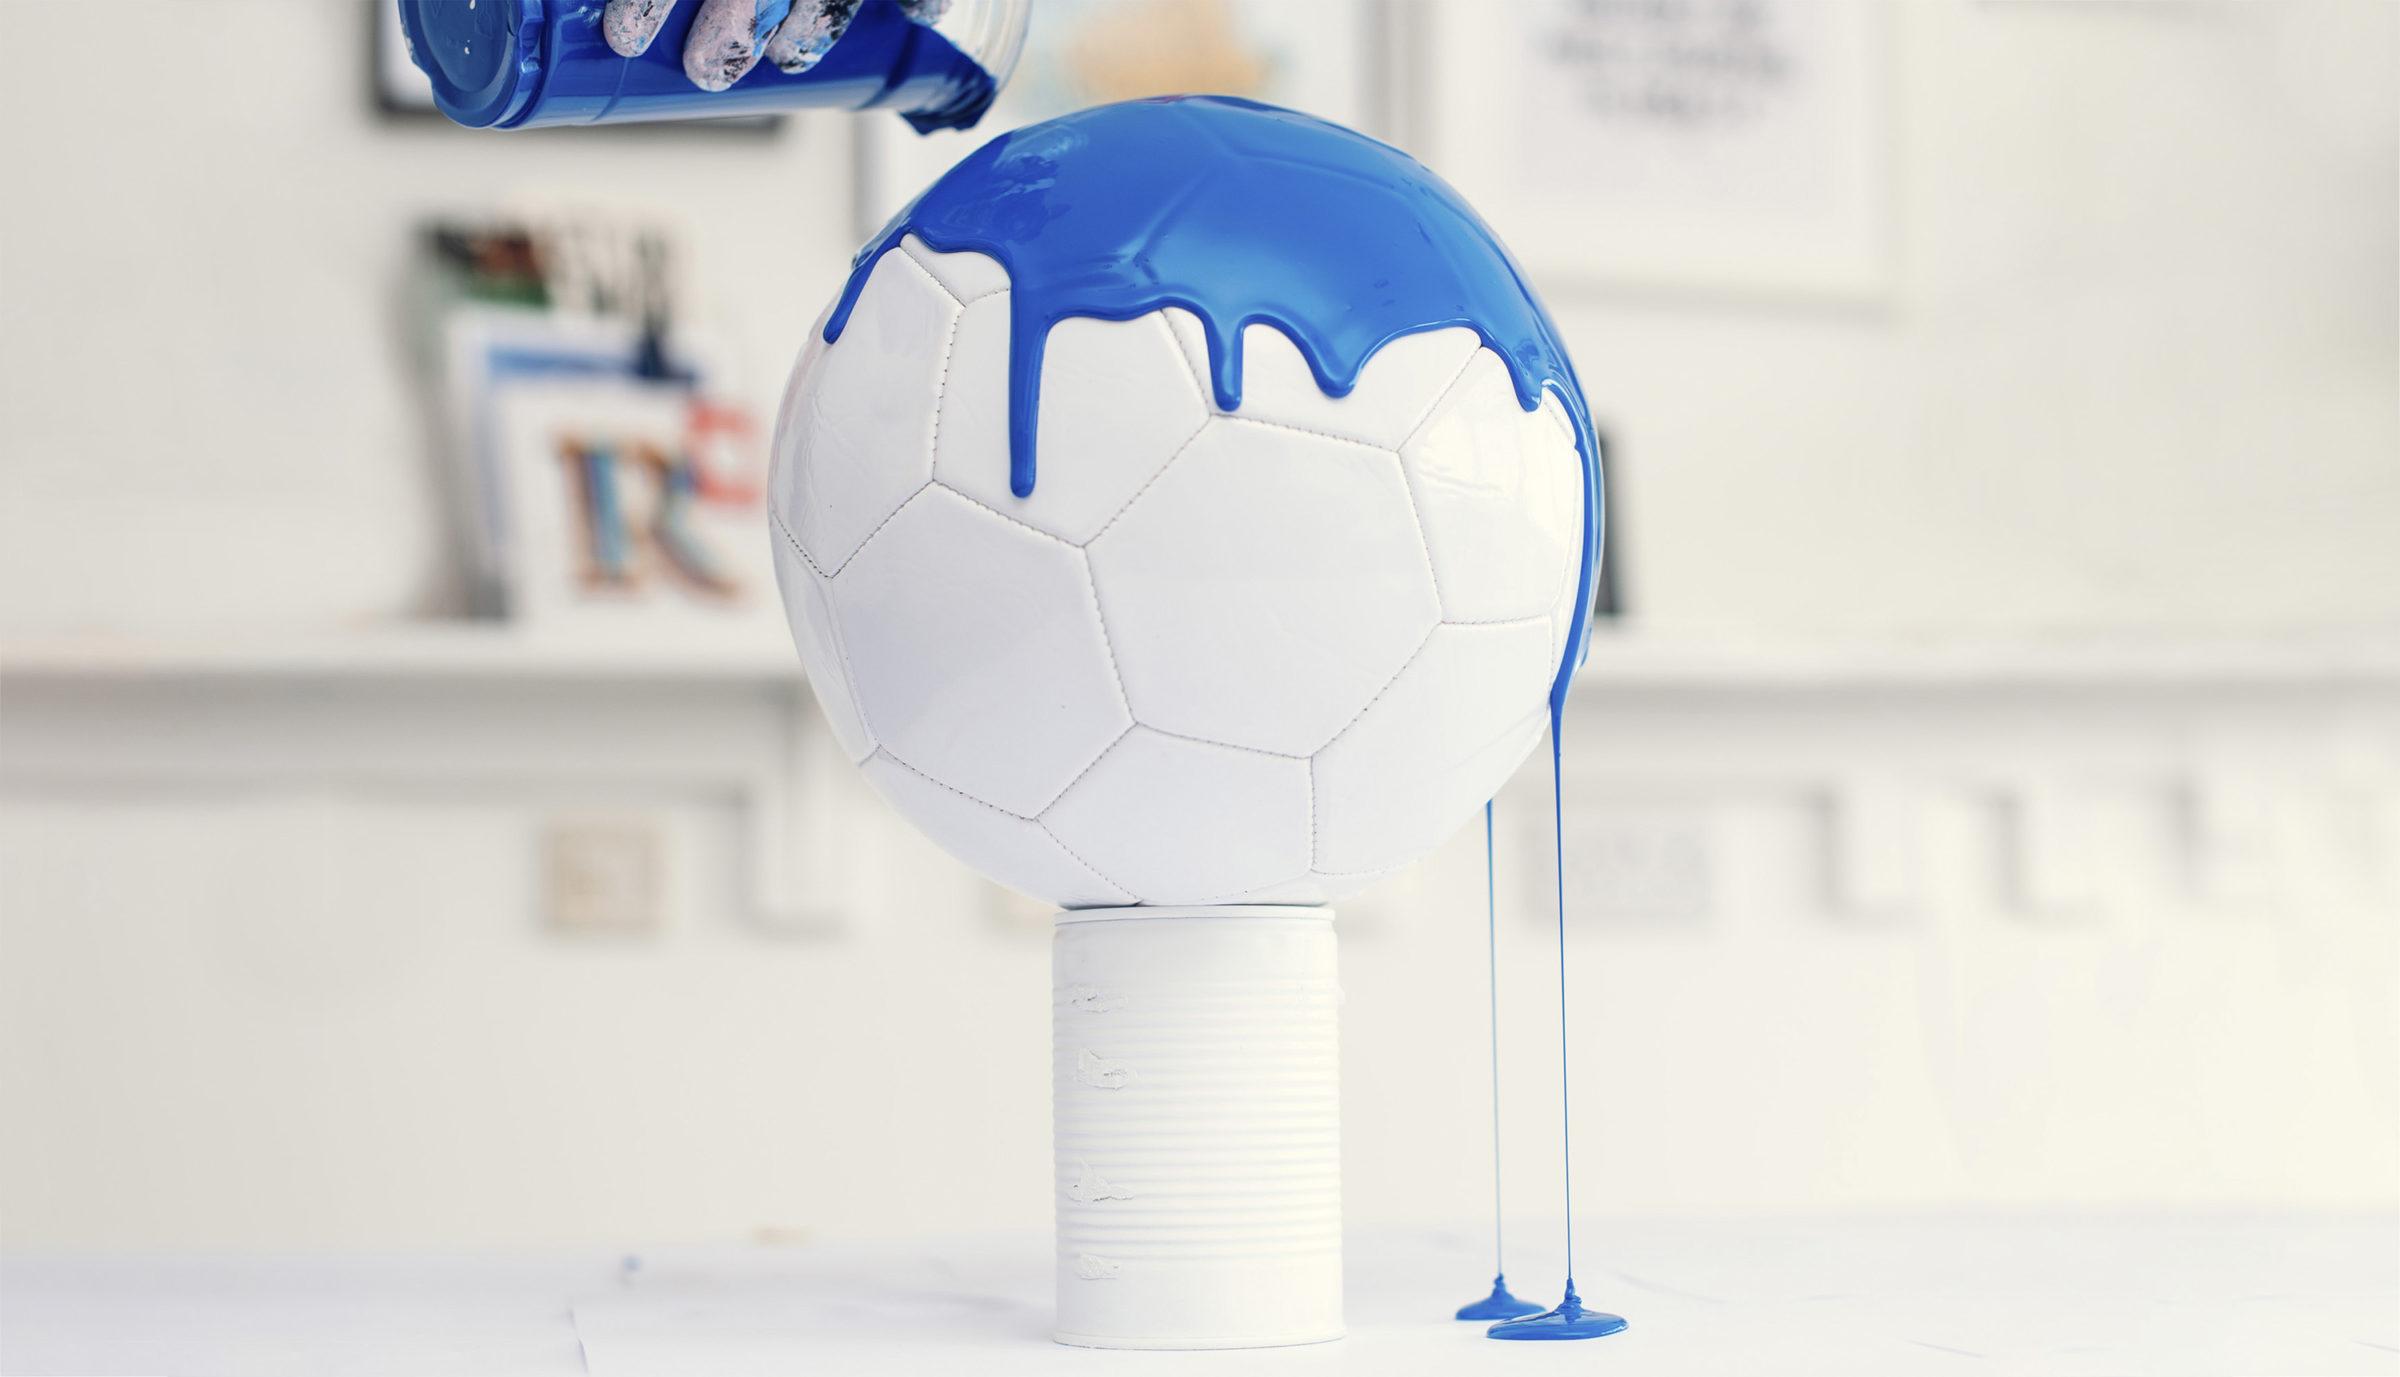 Craig Black x The Fusion Series Footballs Acrylic Fusion Football Art Installation 12 France